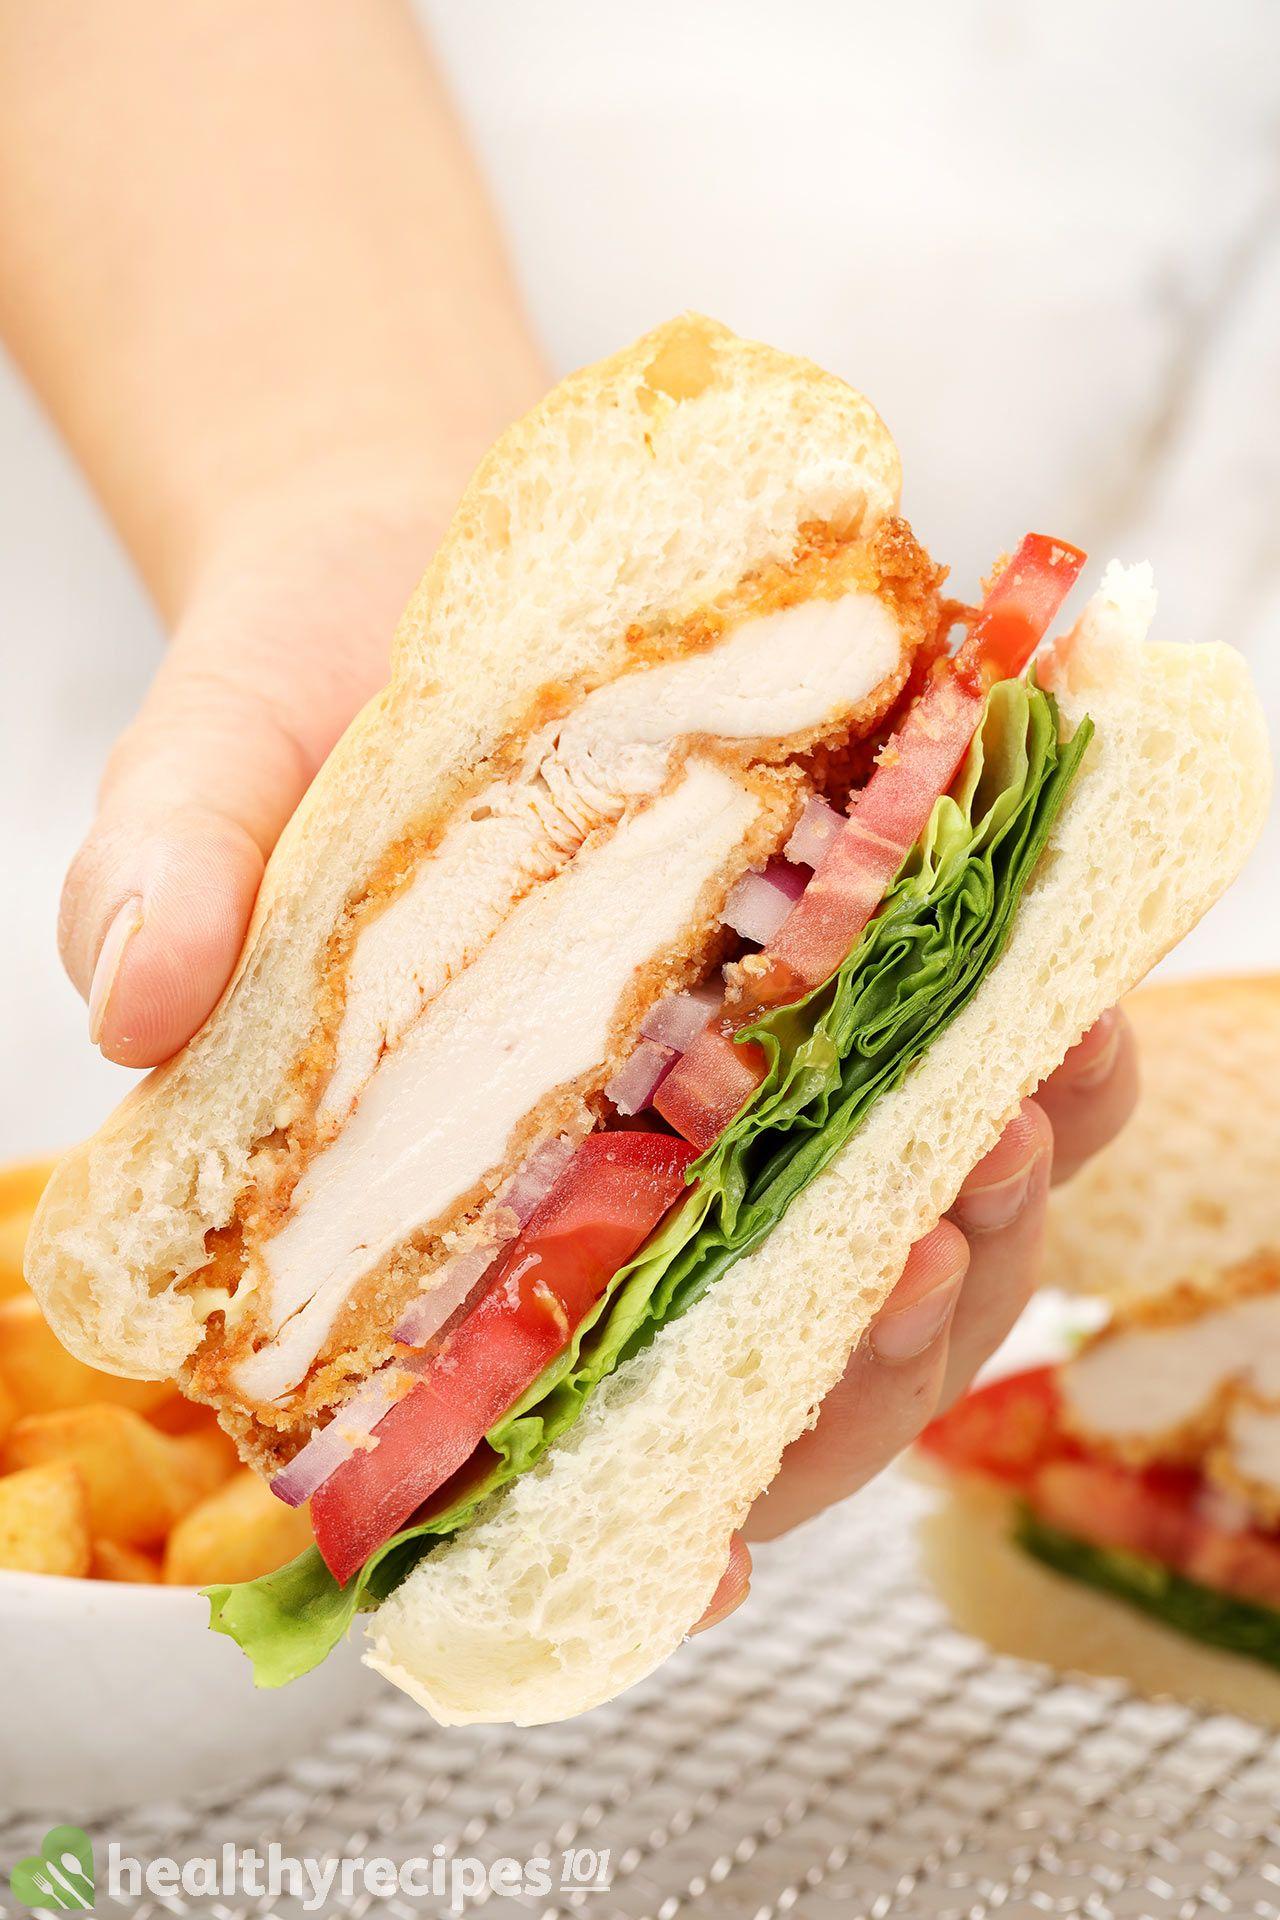 Homemade Air Fryer Chicken Sandwich Recipe